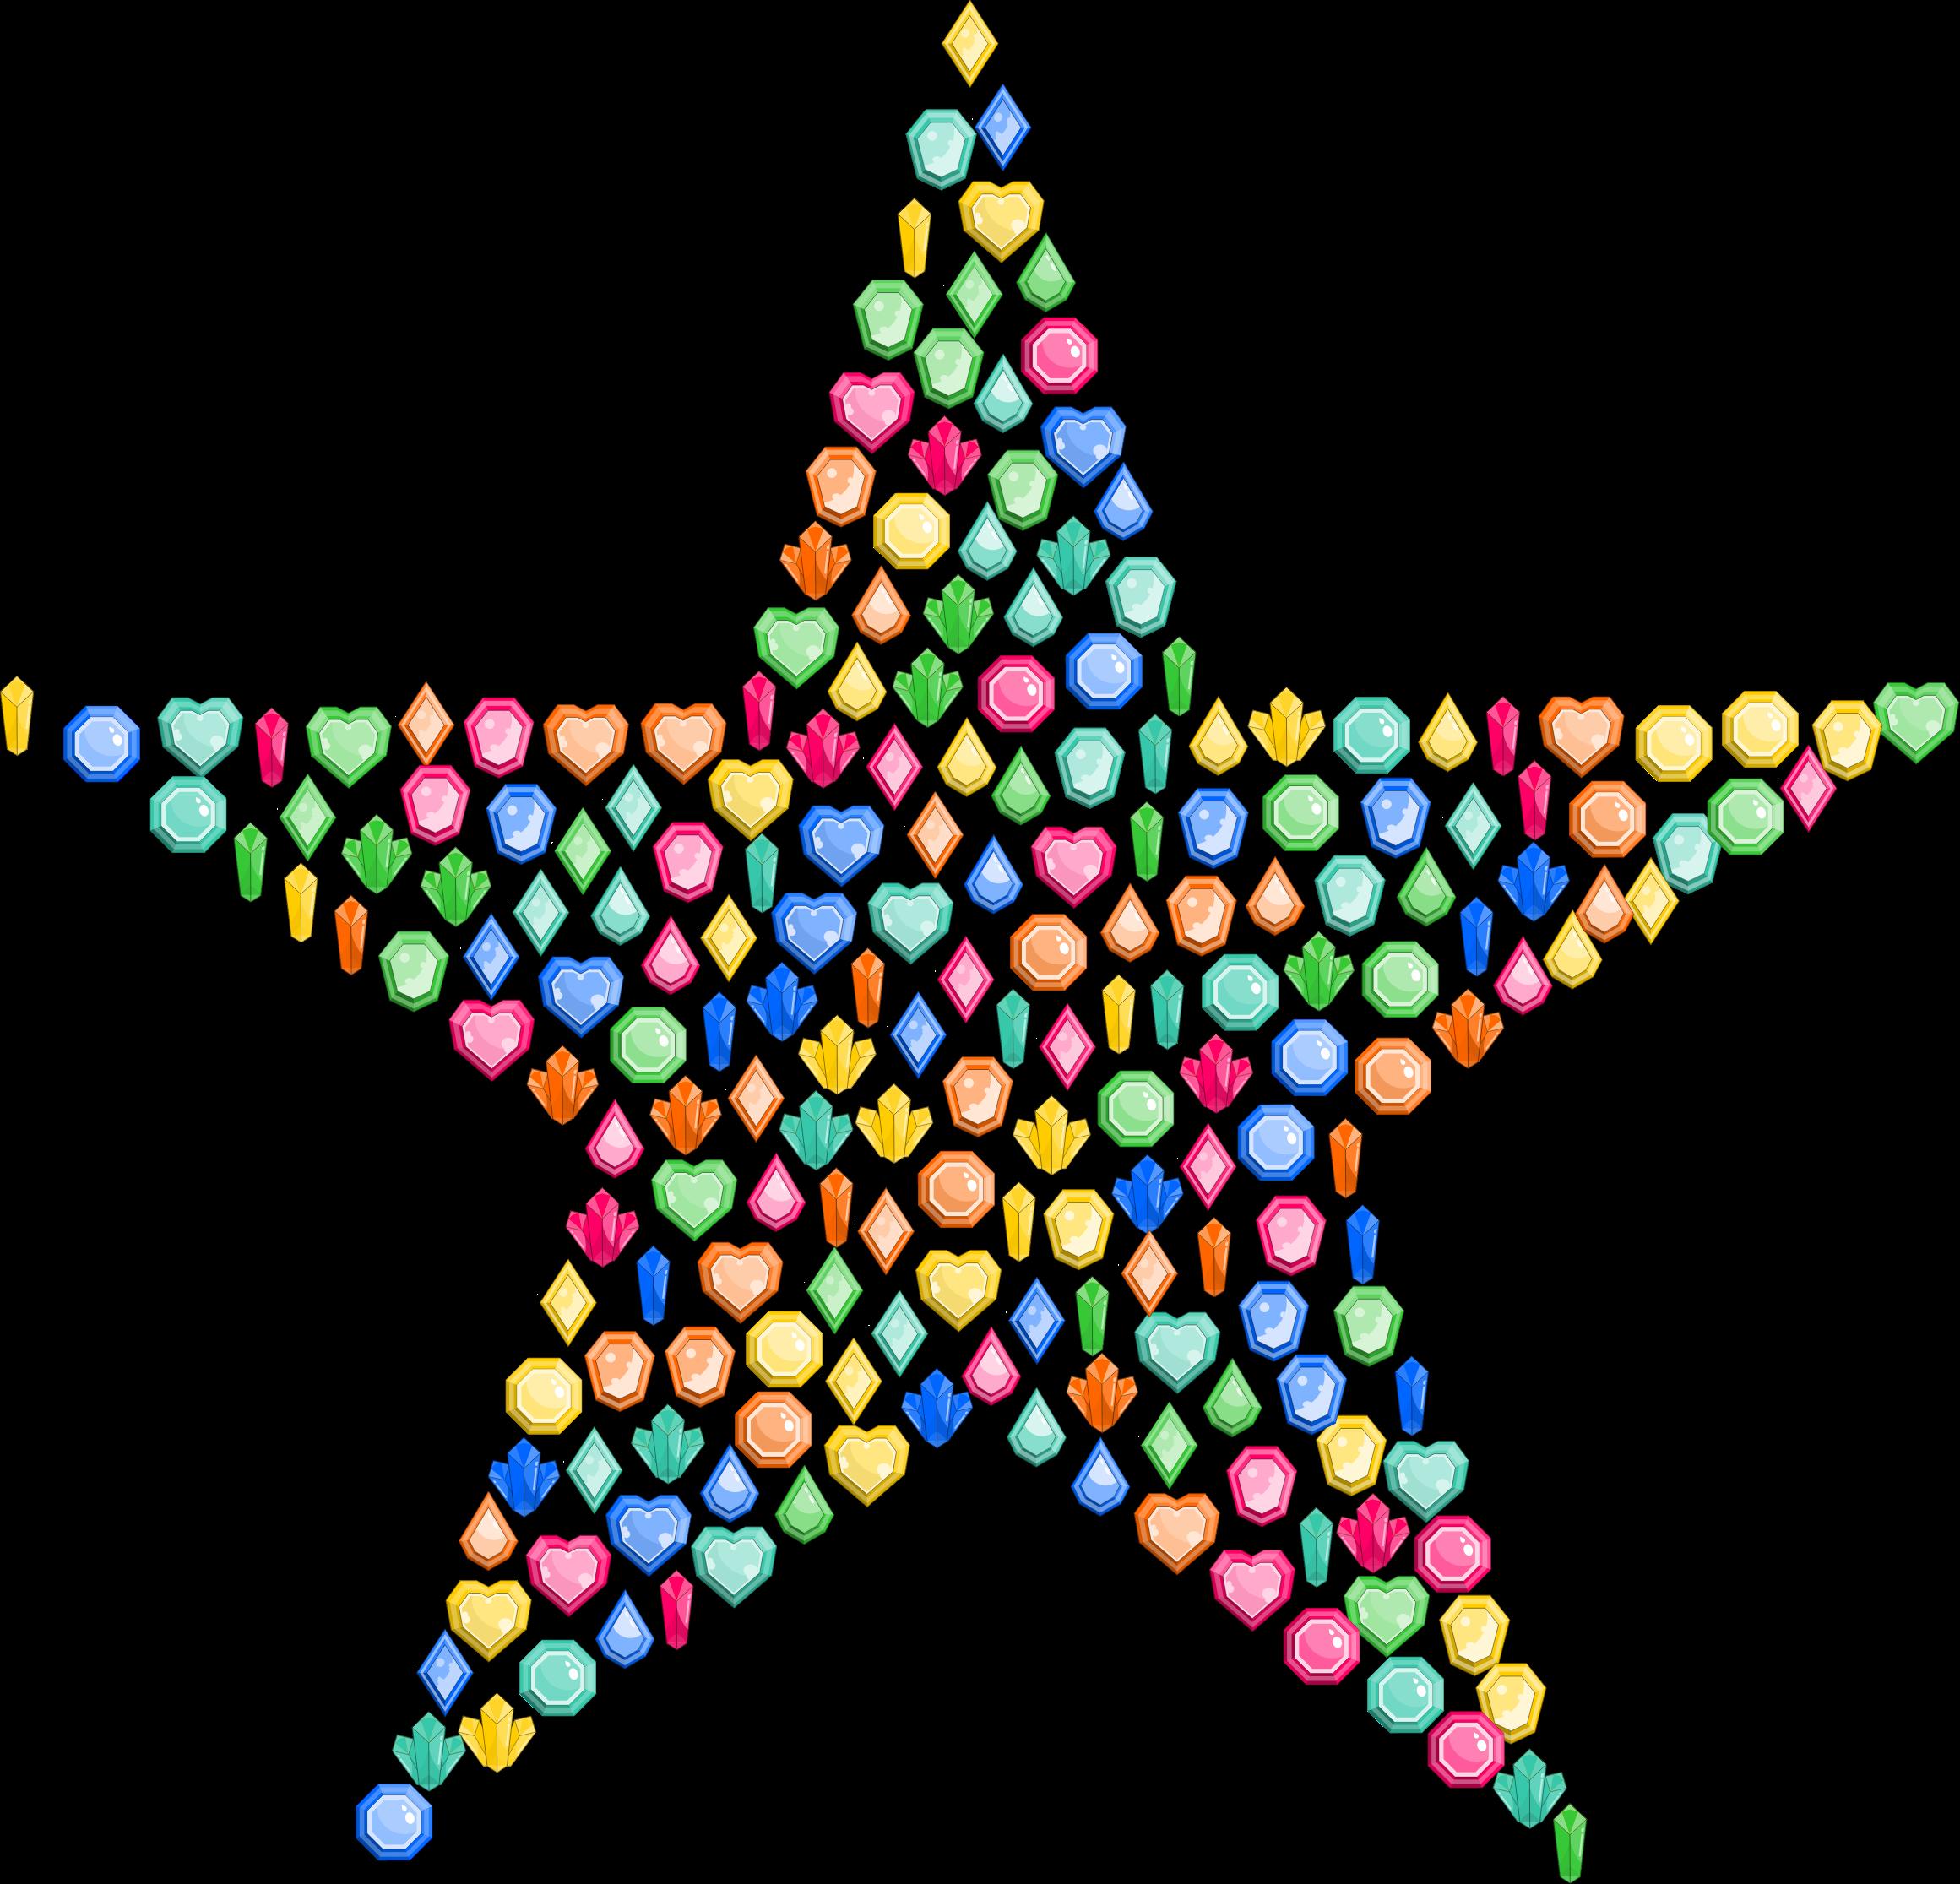 Gems star big image. Gem clipart colorful gem